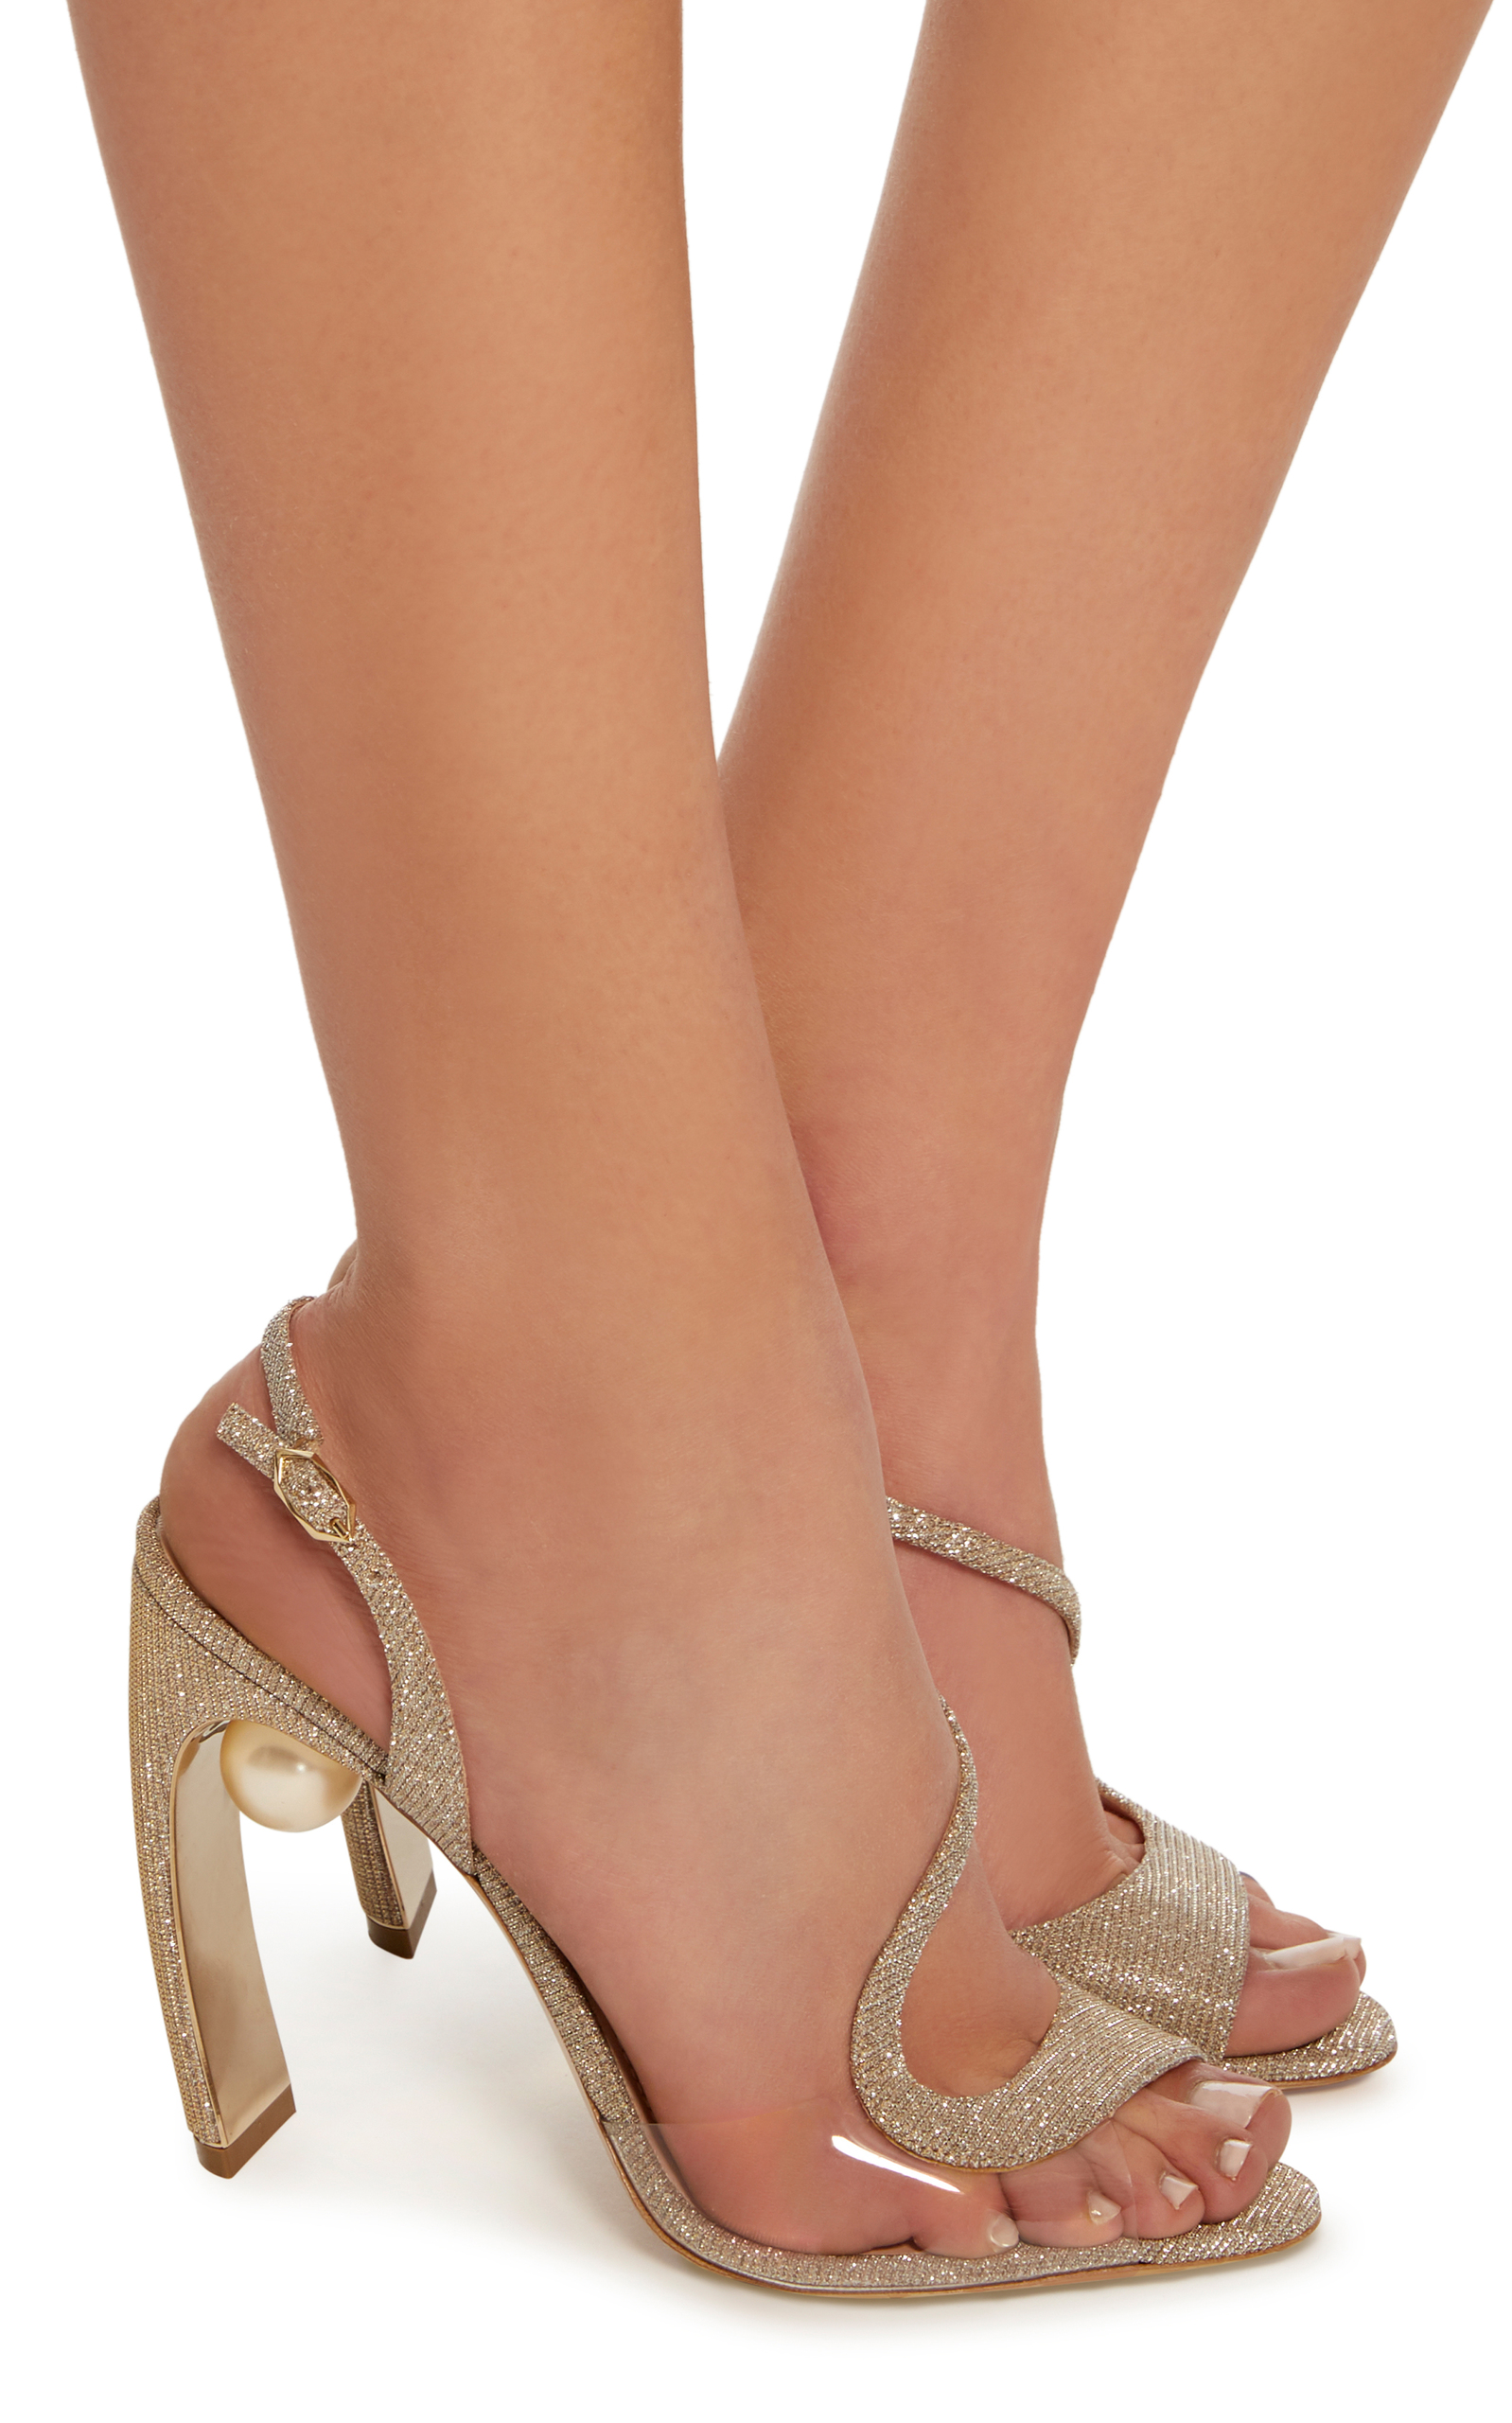 e1ccd7d0eb26 Nicholas KirkwoodMaeva Pearl-Embellished Metallic Sandals. CLOSE. Loading